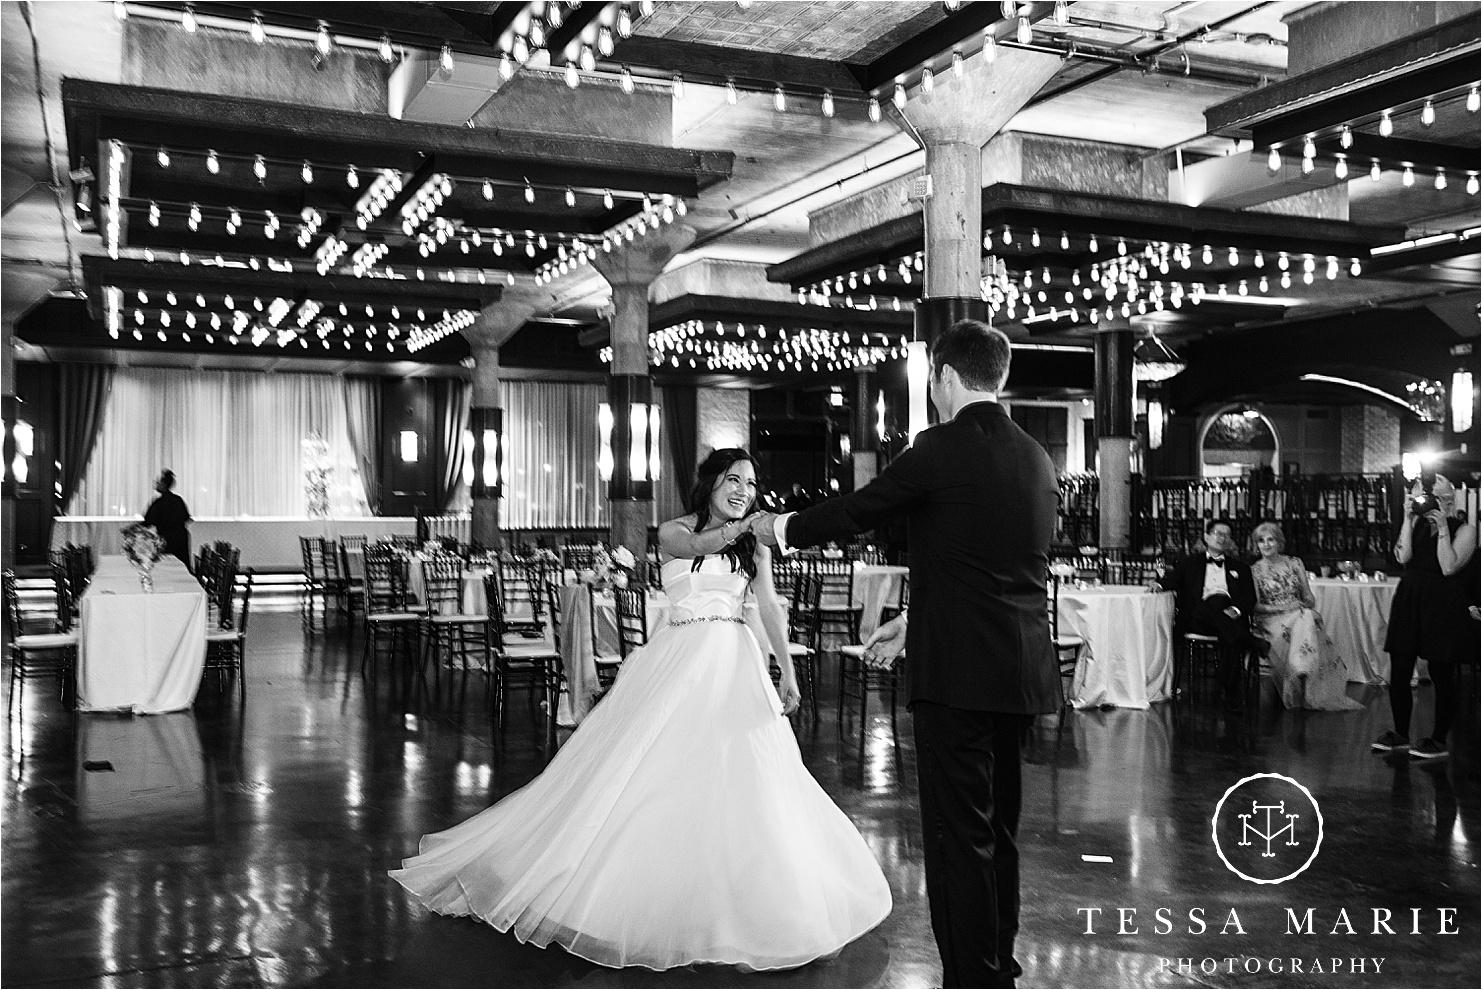 Tessa_marie_weddings_houston_wedding_photographer_The_astorian_0187.jpg